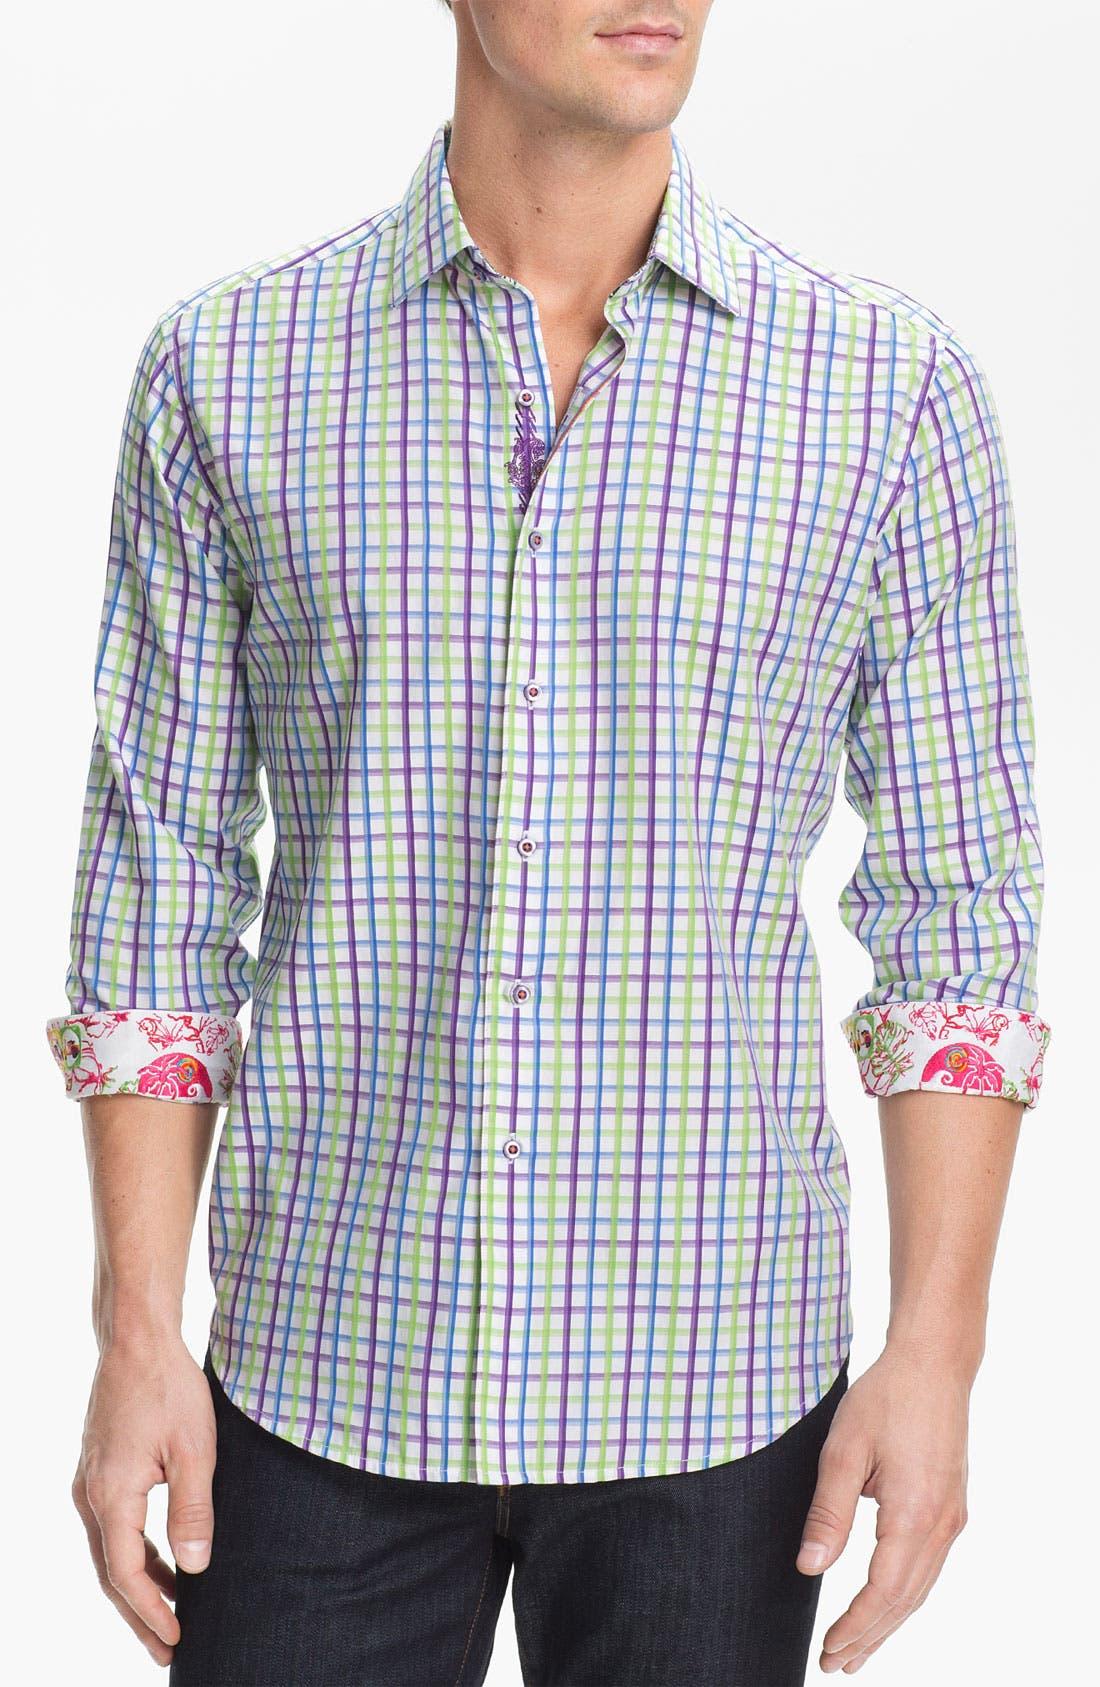 Alternate Image 1 Selected - Robert Graham 'Capella' Sport Shirt